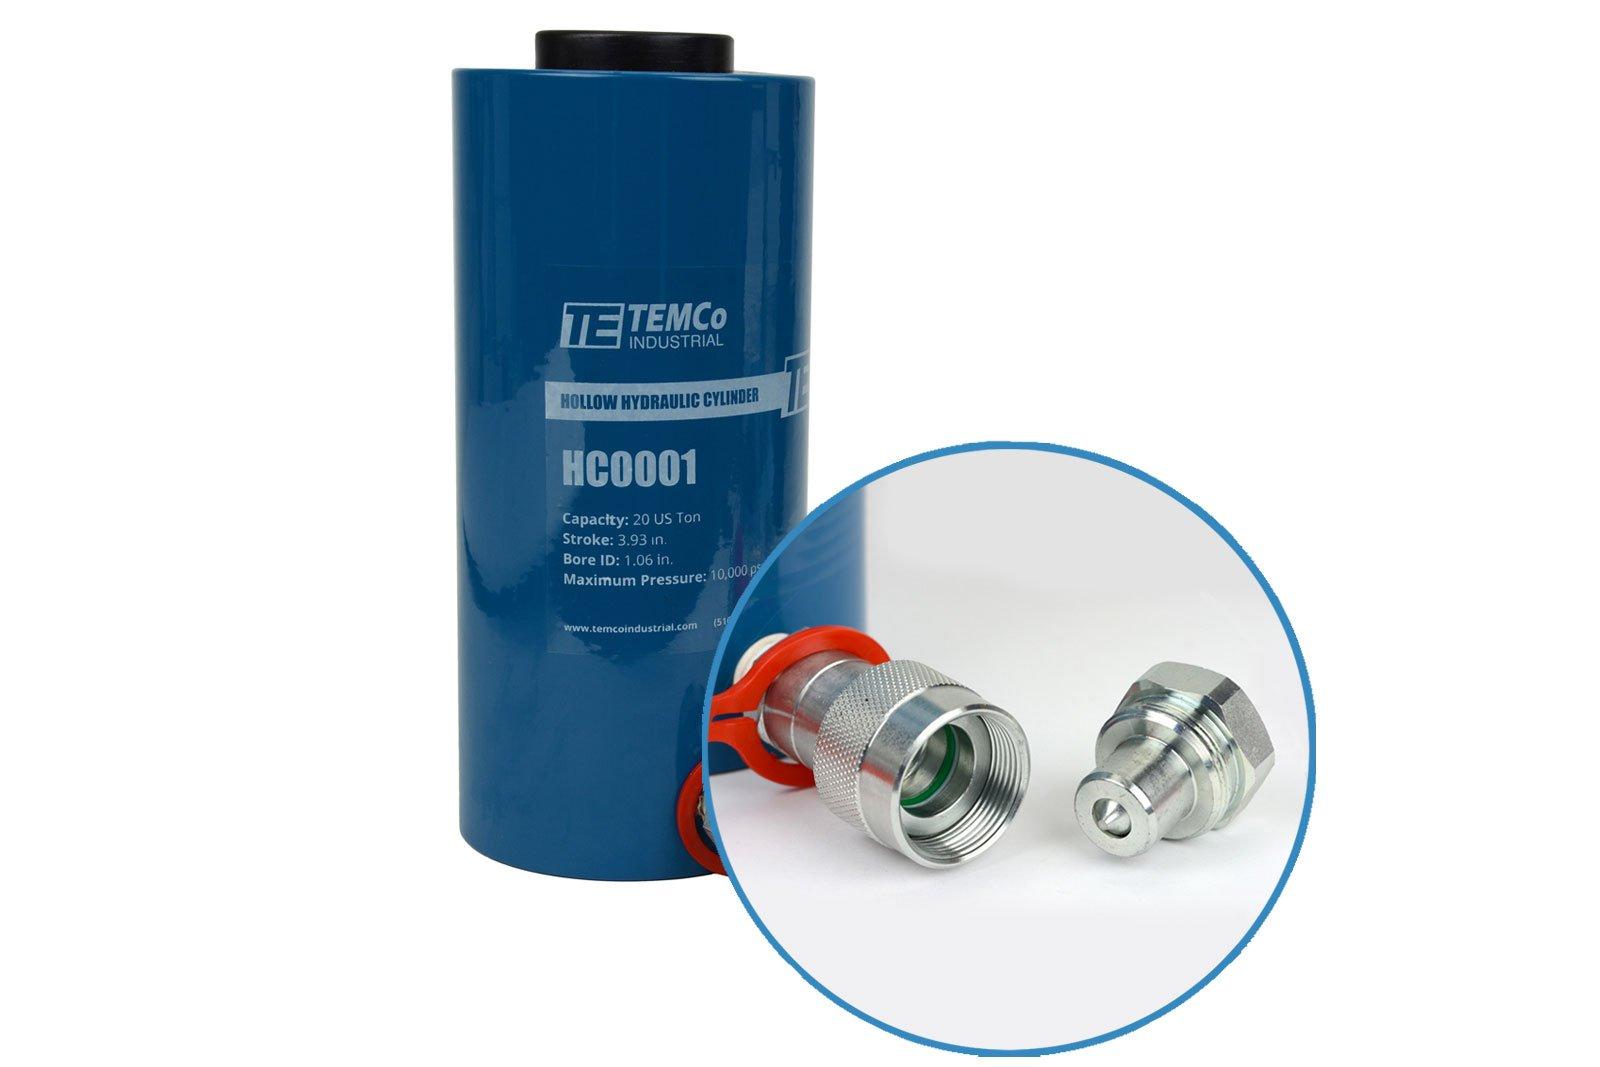 TEMCo HC0001 - Hollow Hydraulic Cylinder Ram 20 TON 4 In Stroke - 5 YEAR Warranty